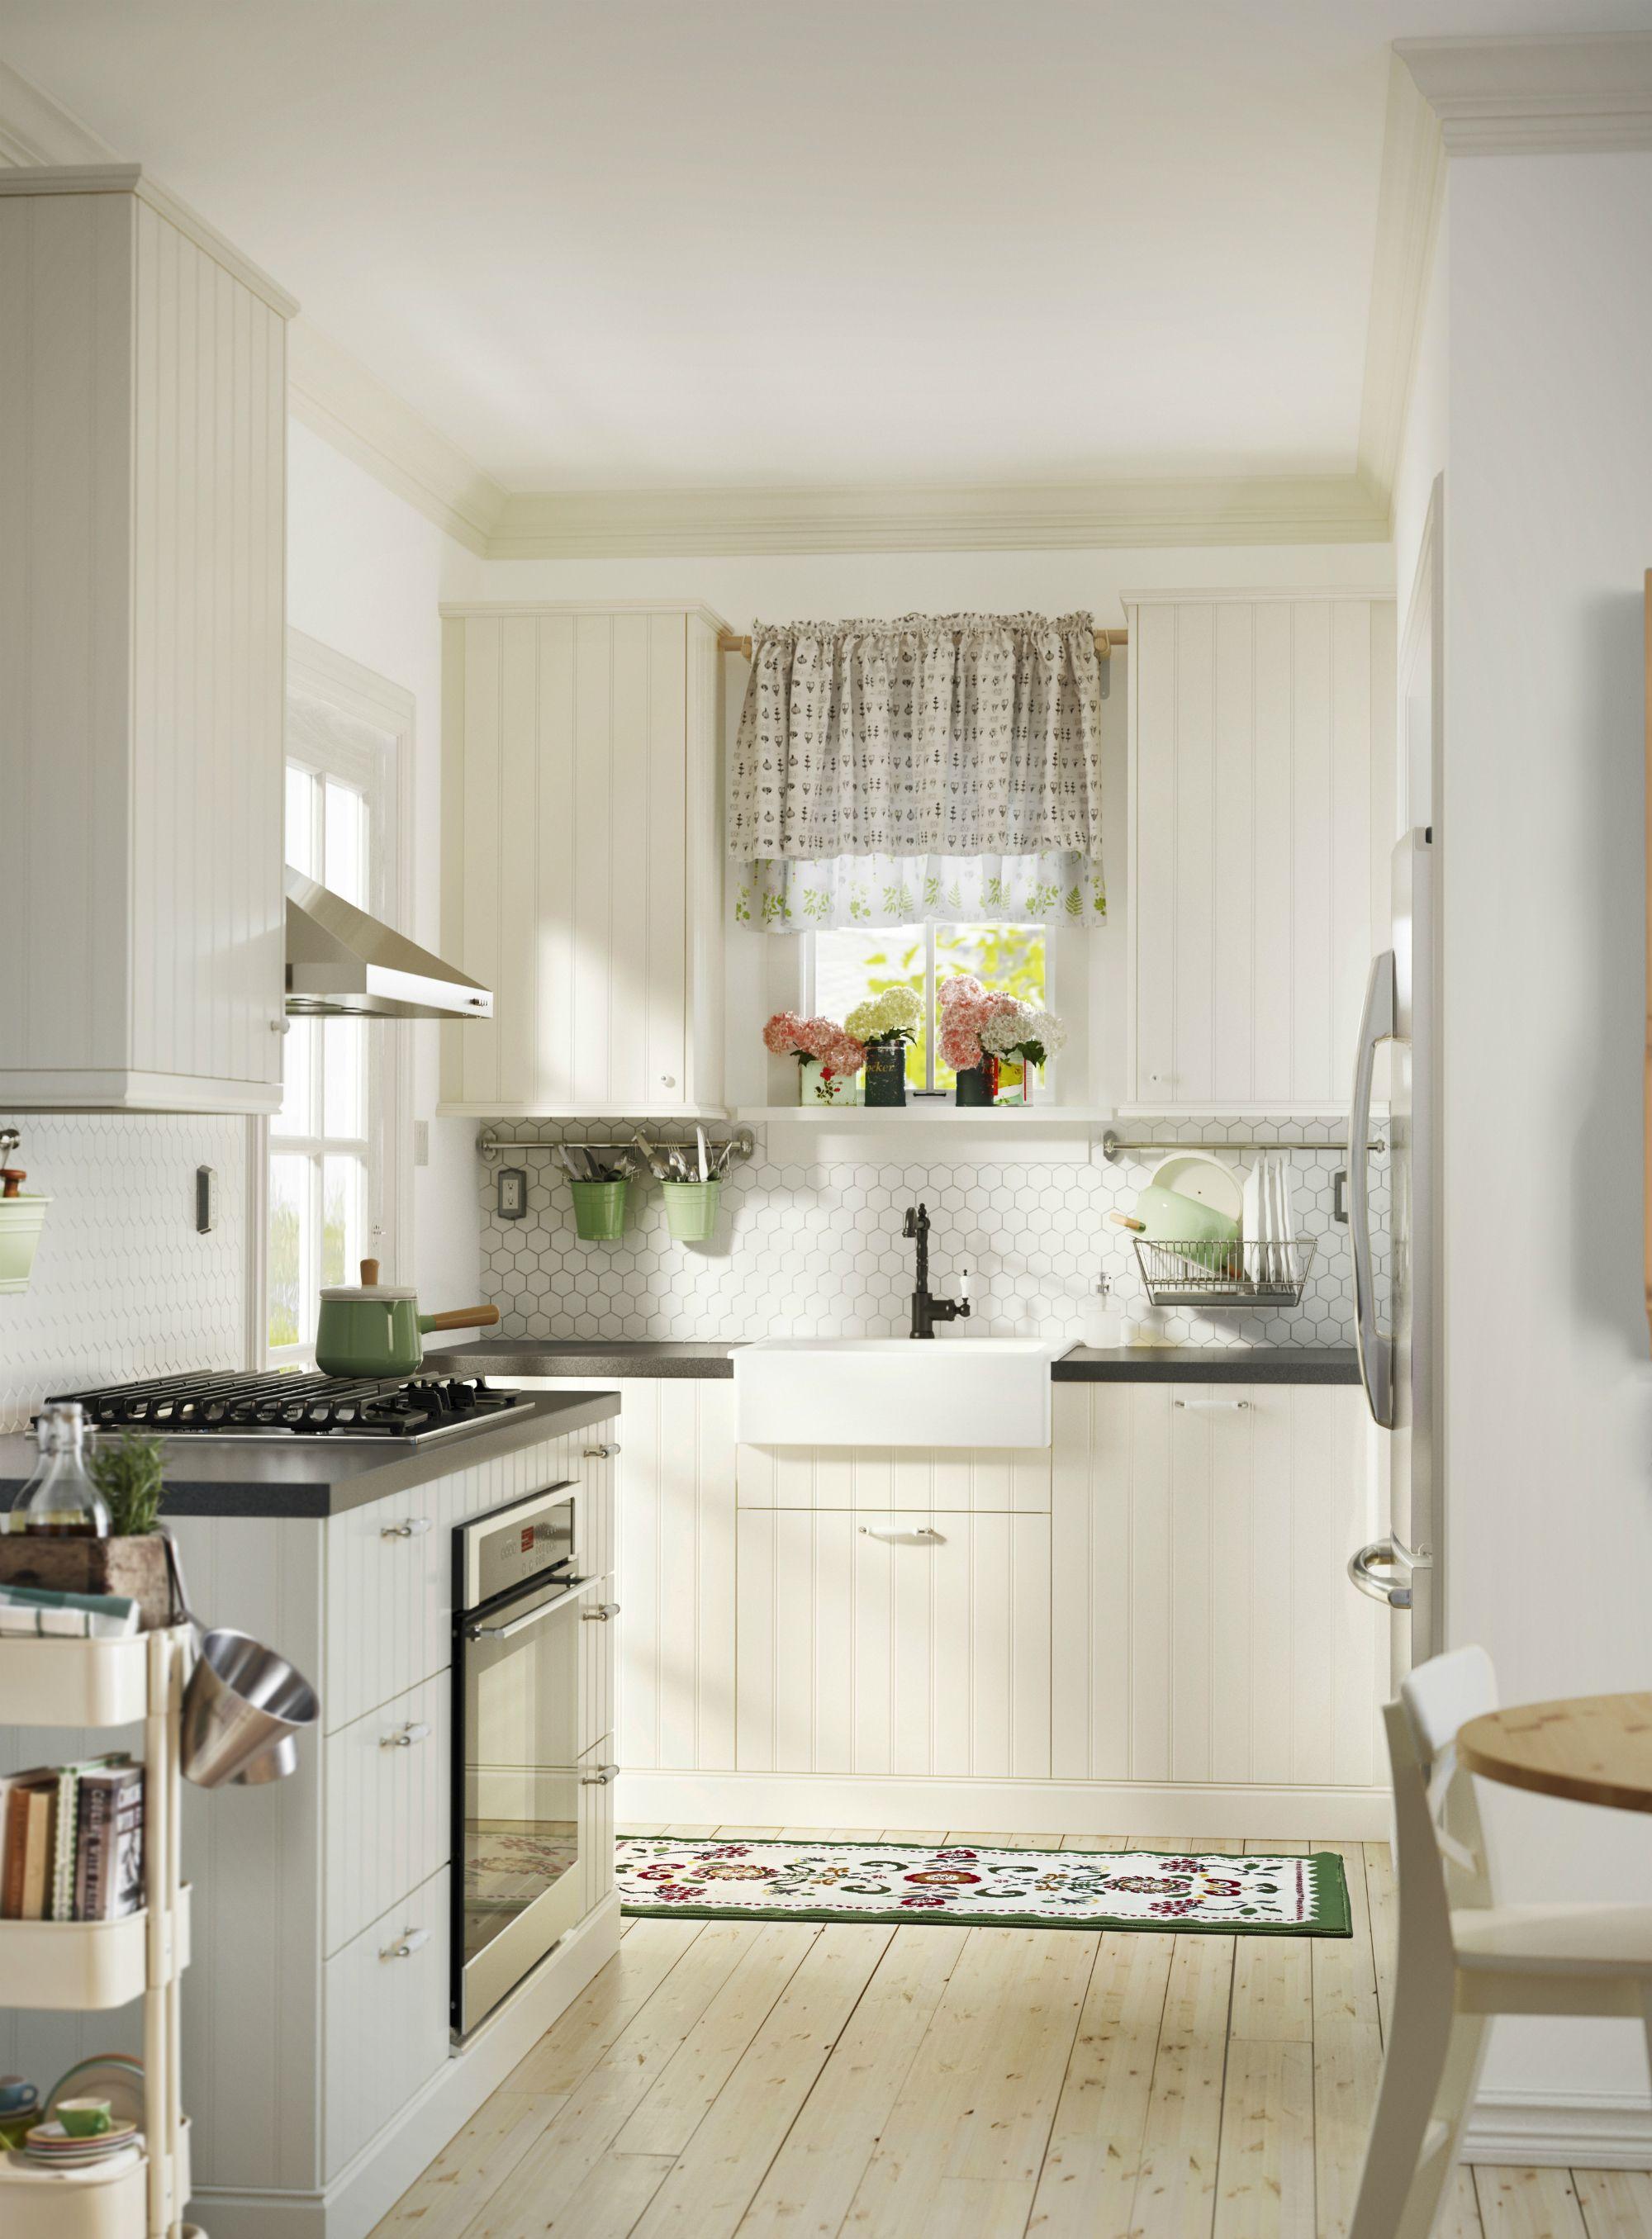 US - Furniture and Home Furnishings in 2019 | Ikea kitchen ...